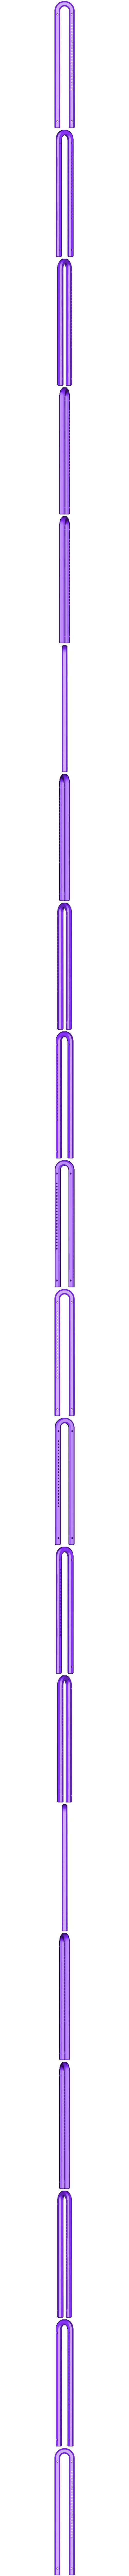 main.stl Download STL file Monkey wrench fidget toy • 3D print design, glargonoid